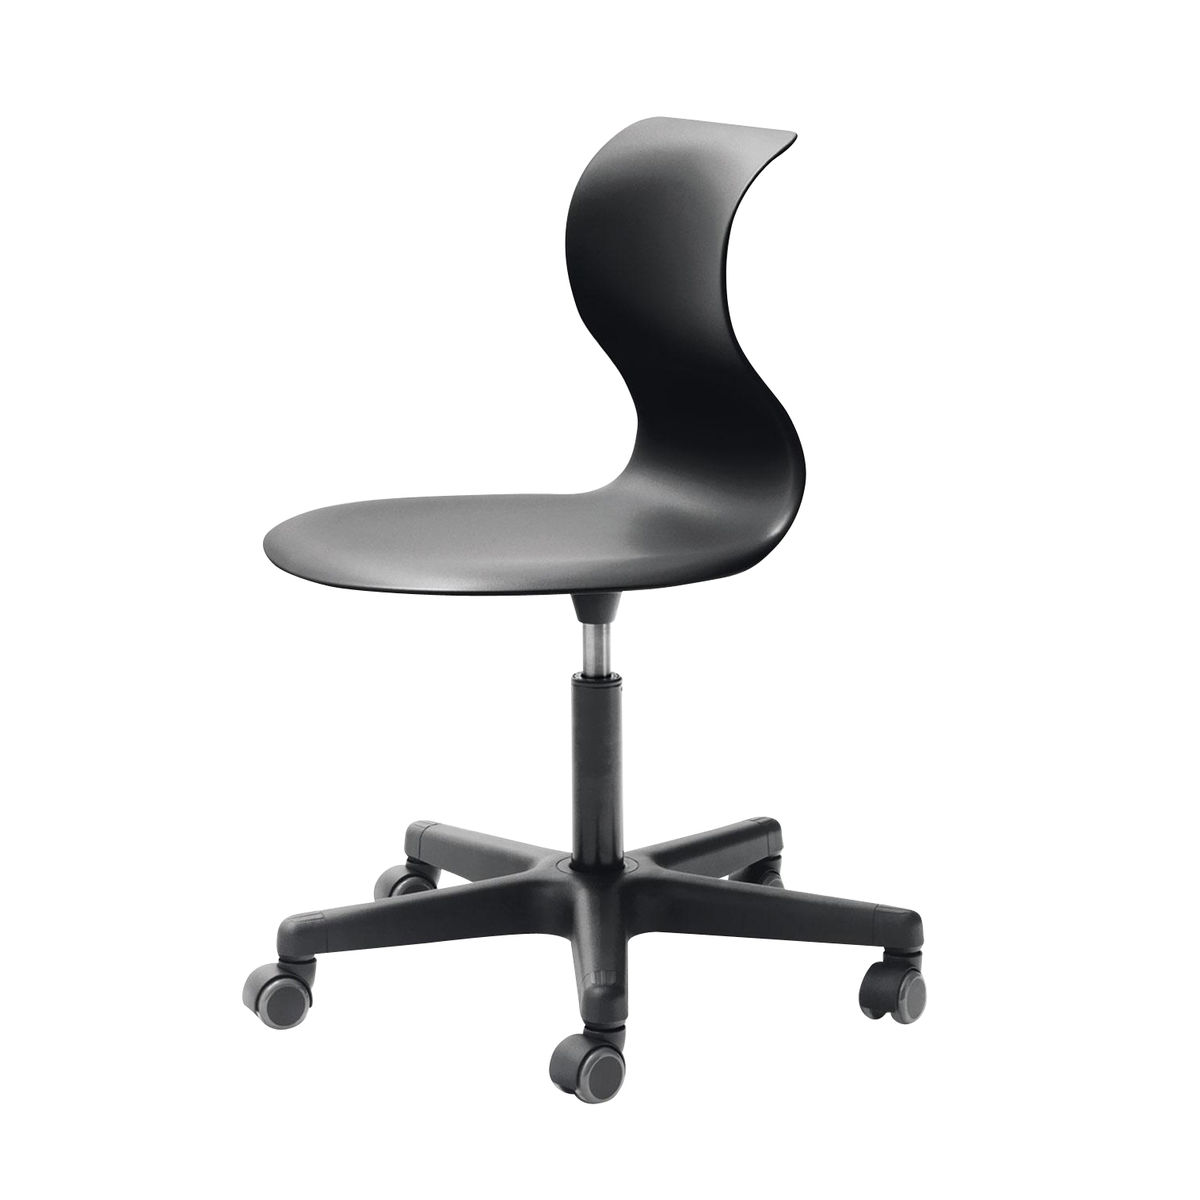 Delightful ... Flötotto   Pro 6 Swivel Chair With Wheels   Black/frame Black Polyamide/ Seat ...